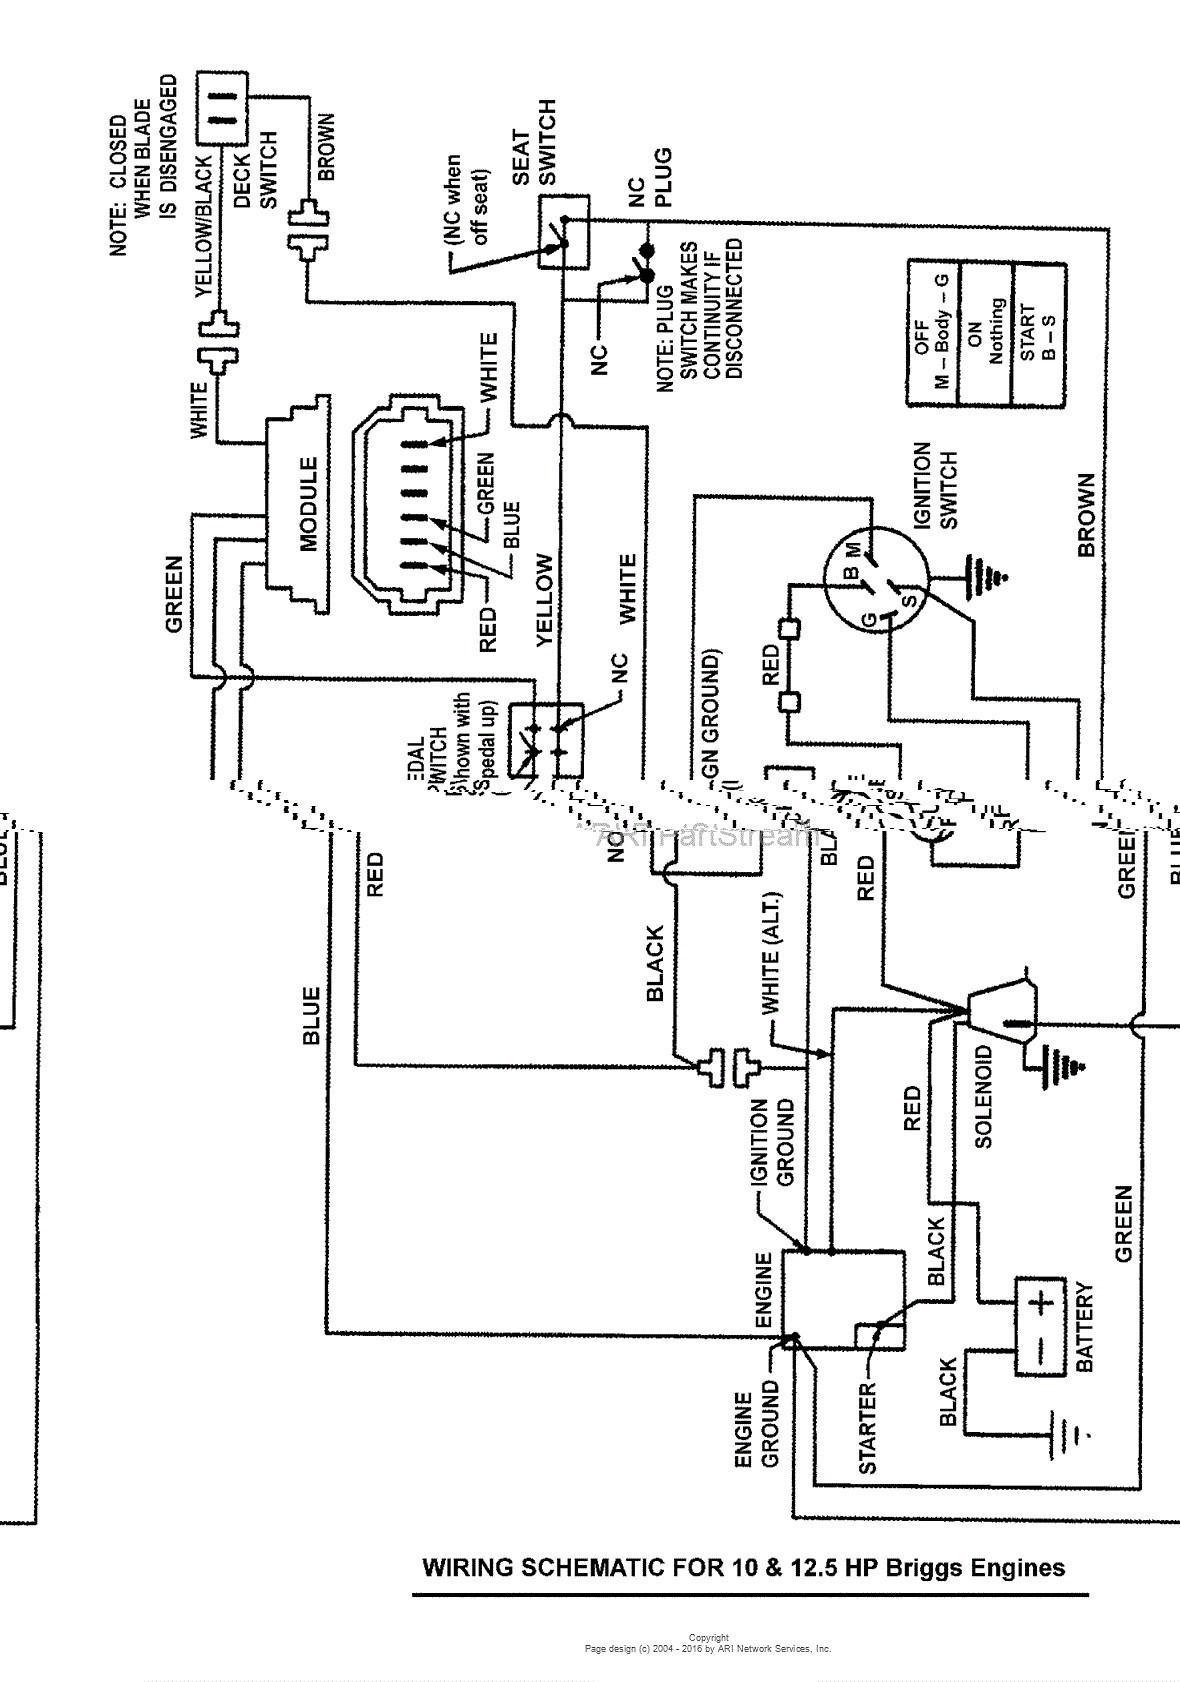 Briggs and Stratton 6 5 Hp Engine Diagram 2 Briggs and Stratton V Twin Wiring Diagram Best Fine Small Engine Of Briggs and Stratton 6 5 Hp Engine Diagram 2